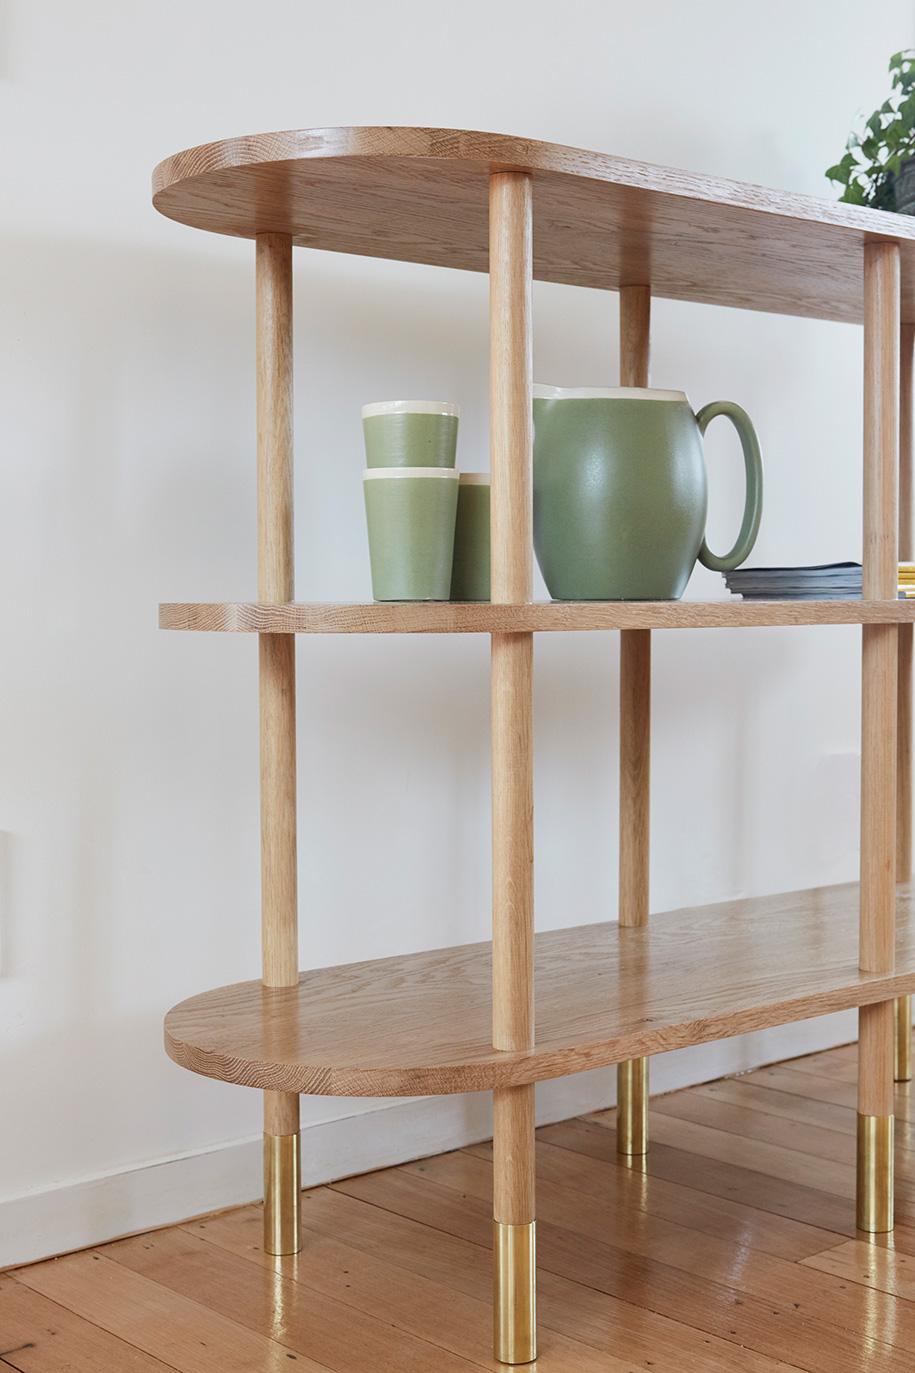 Aspect shelves close Room By Room